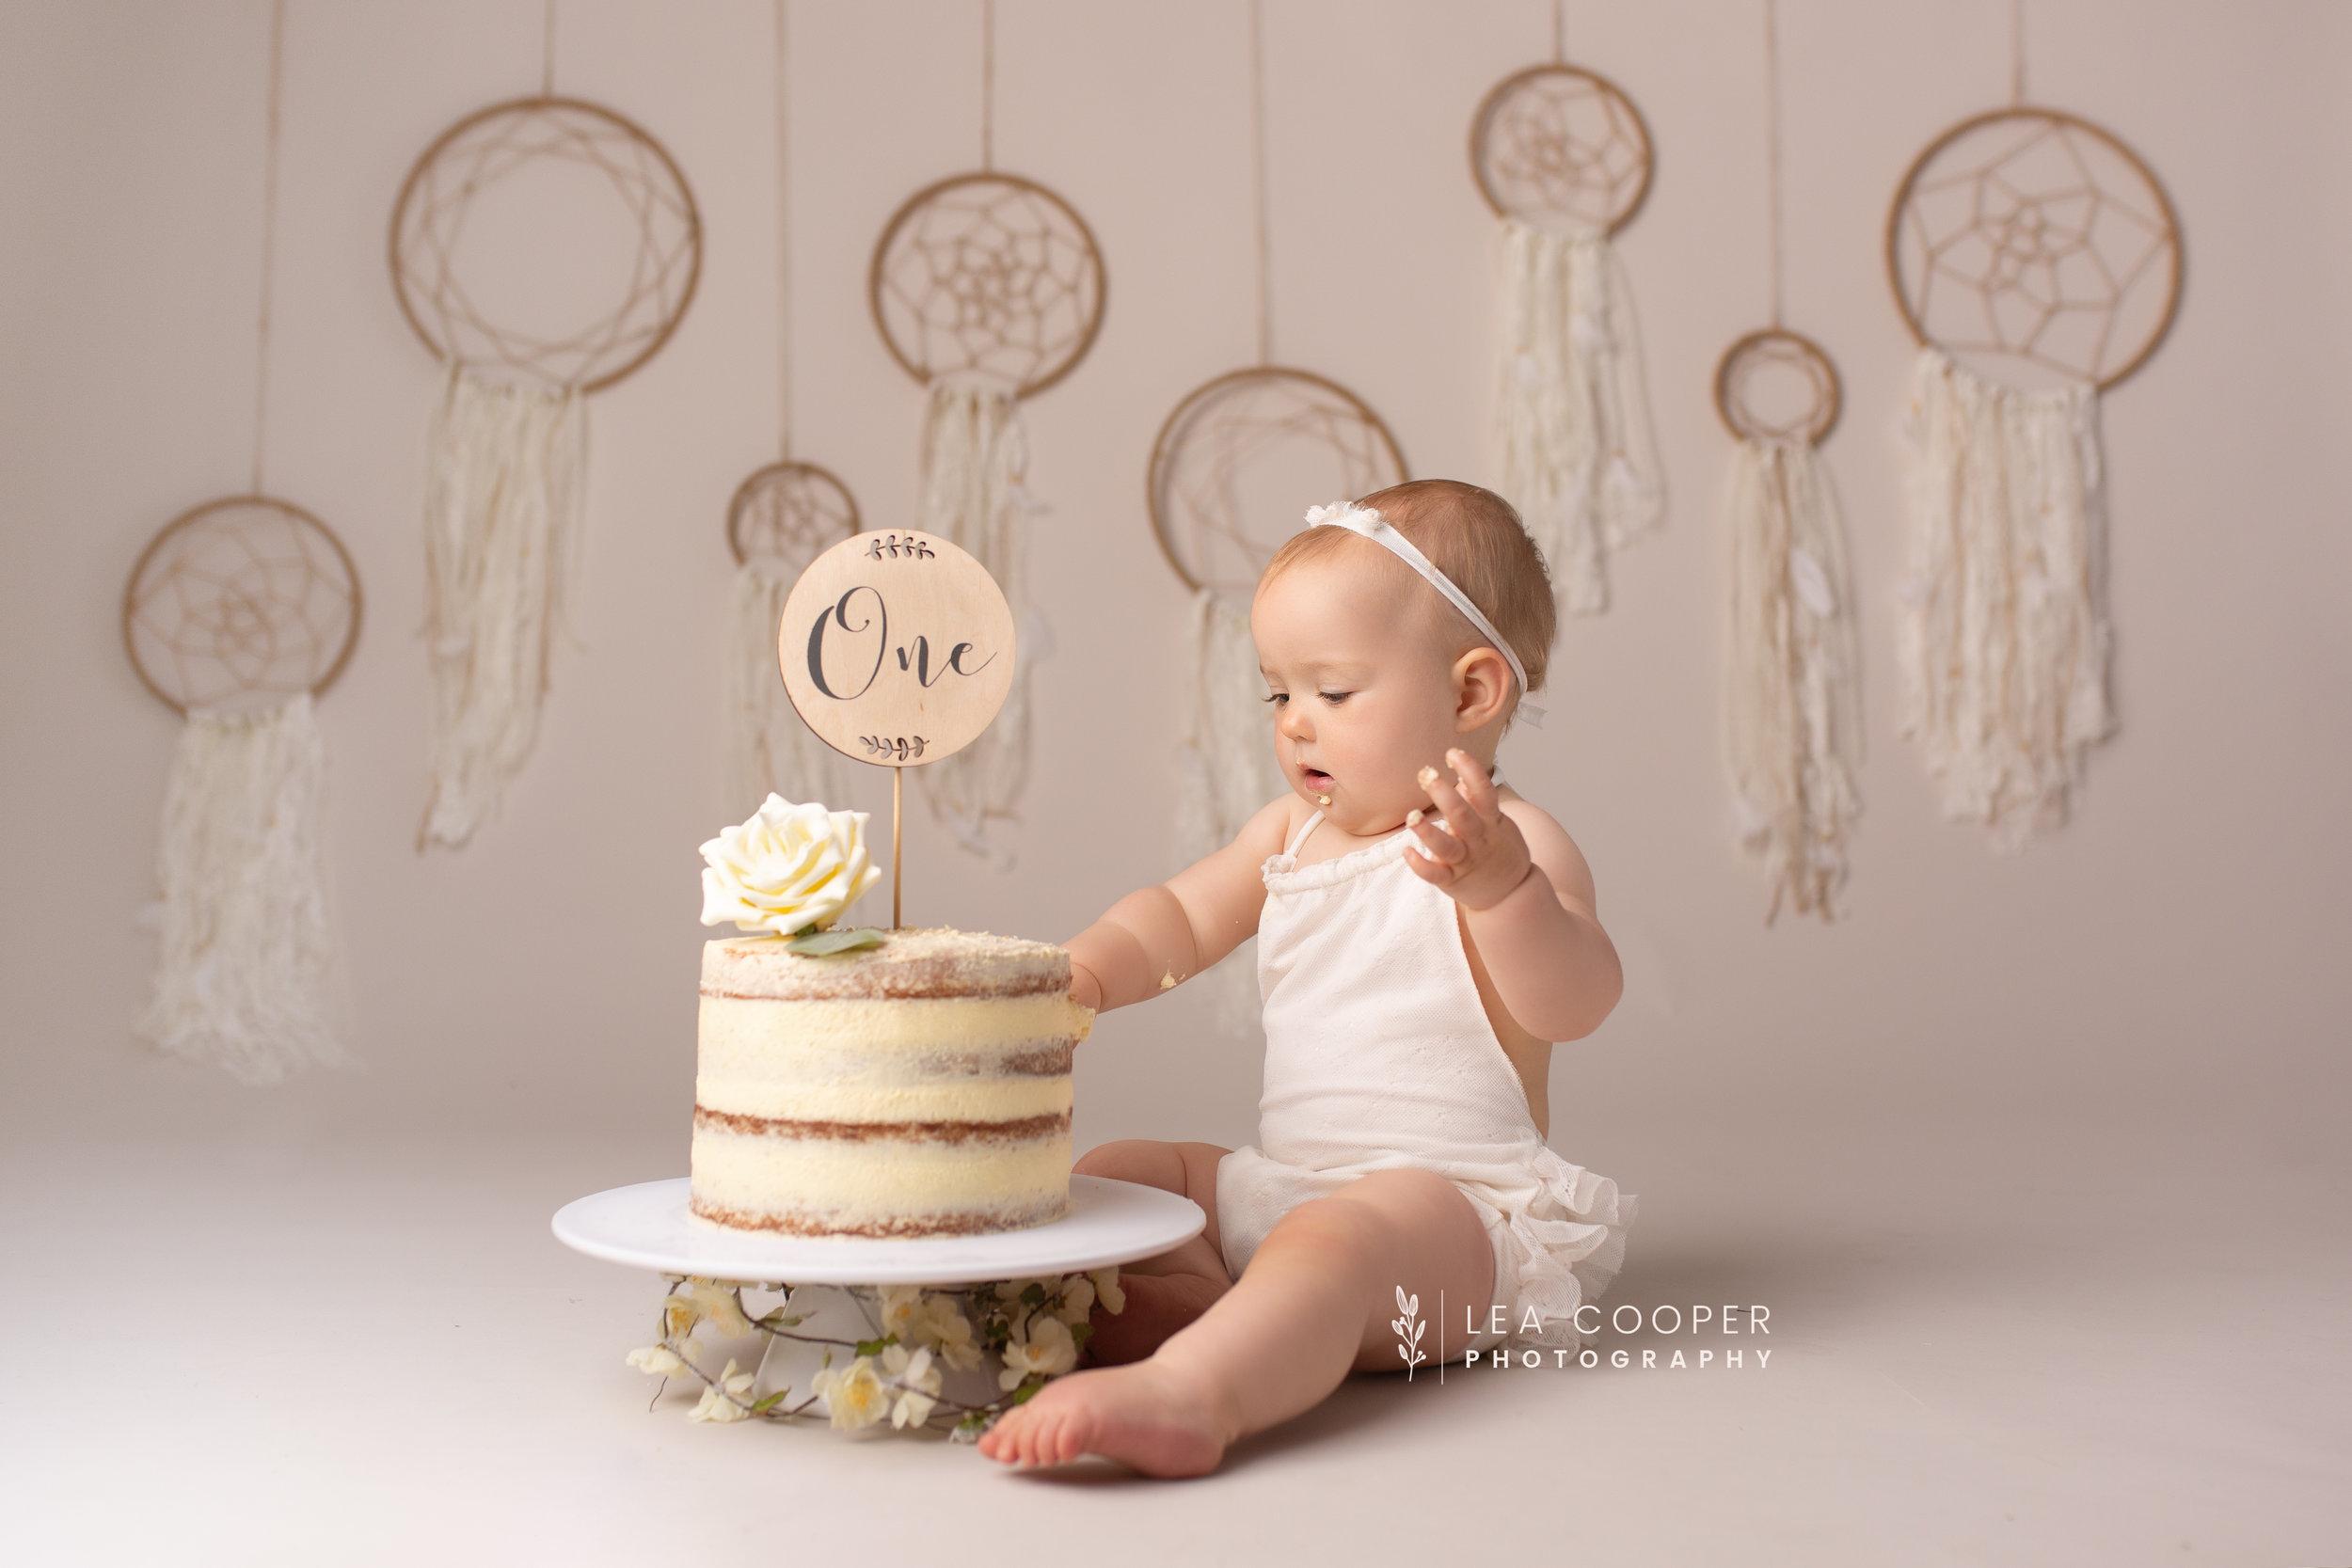 LEA-COOPER-PHOTOGRAPHY-CAKE-SMASH-SESSION-BIRTHDAY-PHOTOS-1ST-BIRTHDAY-SPLASH-SESSION-SMASH-SESSION-CHILDRENS-PHOTOGRAPHY-WILLENHALL-WOLVERHAMPTON-BIRMINGHAM-WEST-MIDLANDS-UK-7.jpg